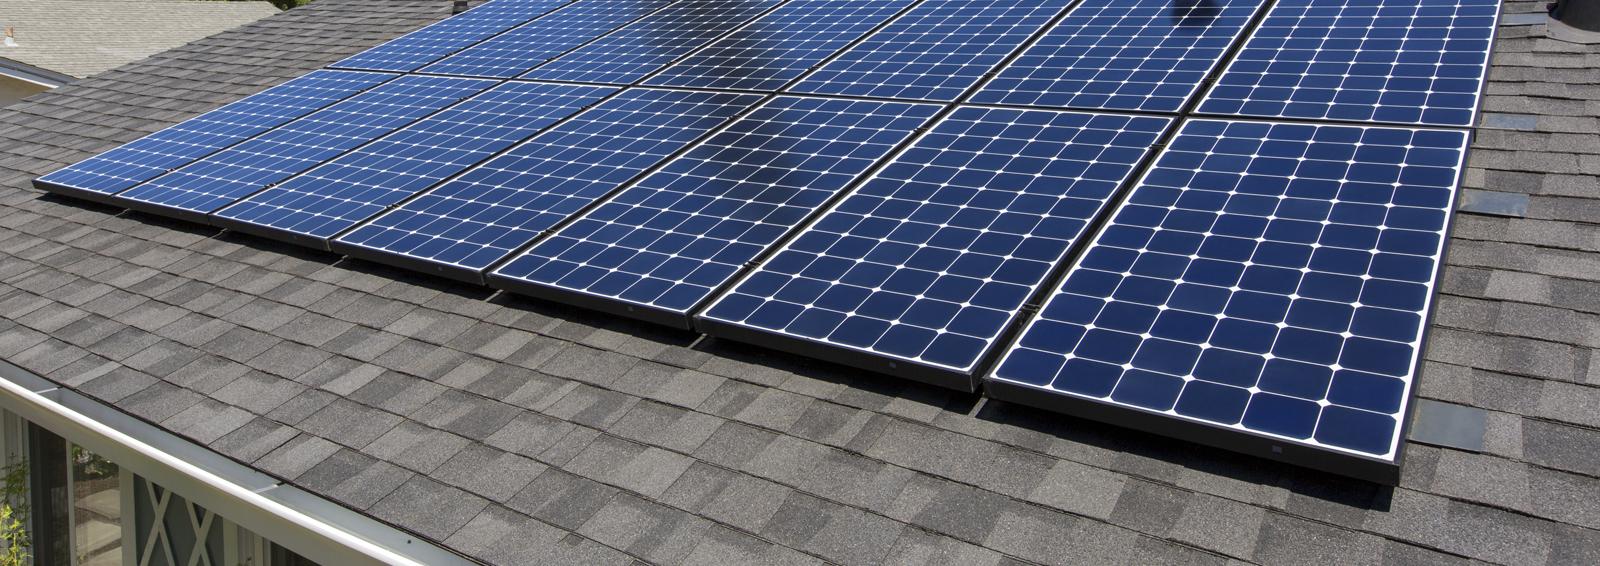 Incentivi pannelli fotovoltaici 2013 89